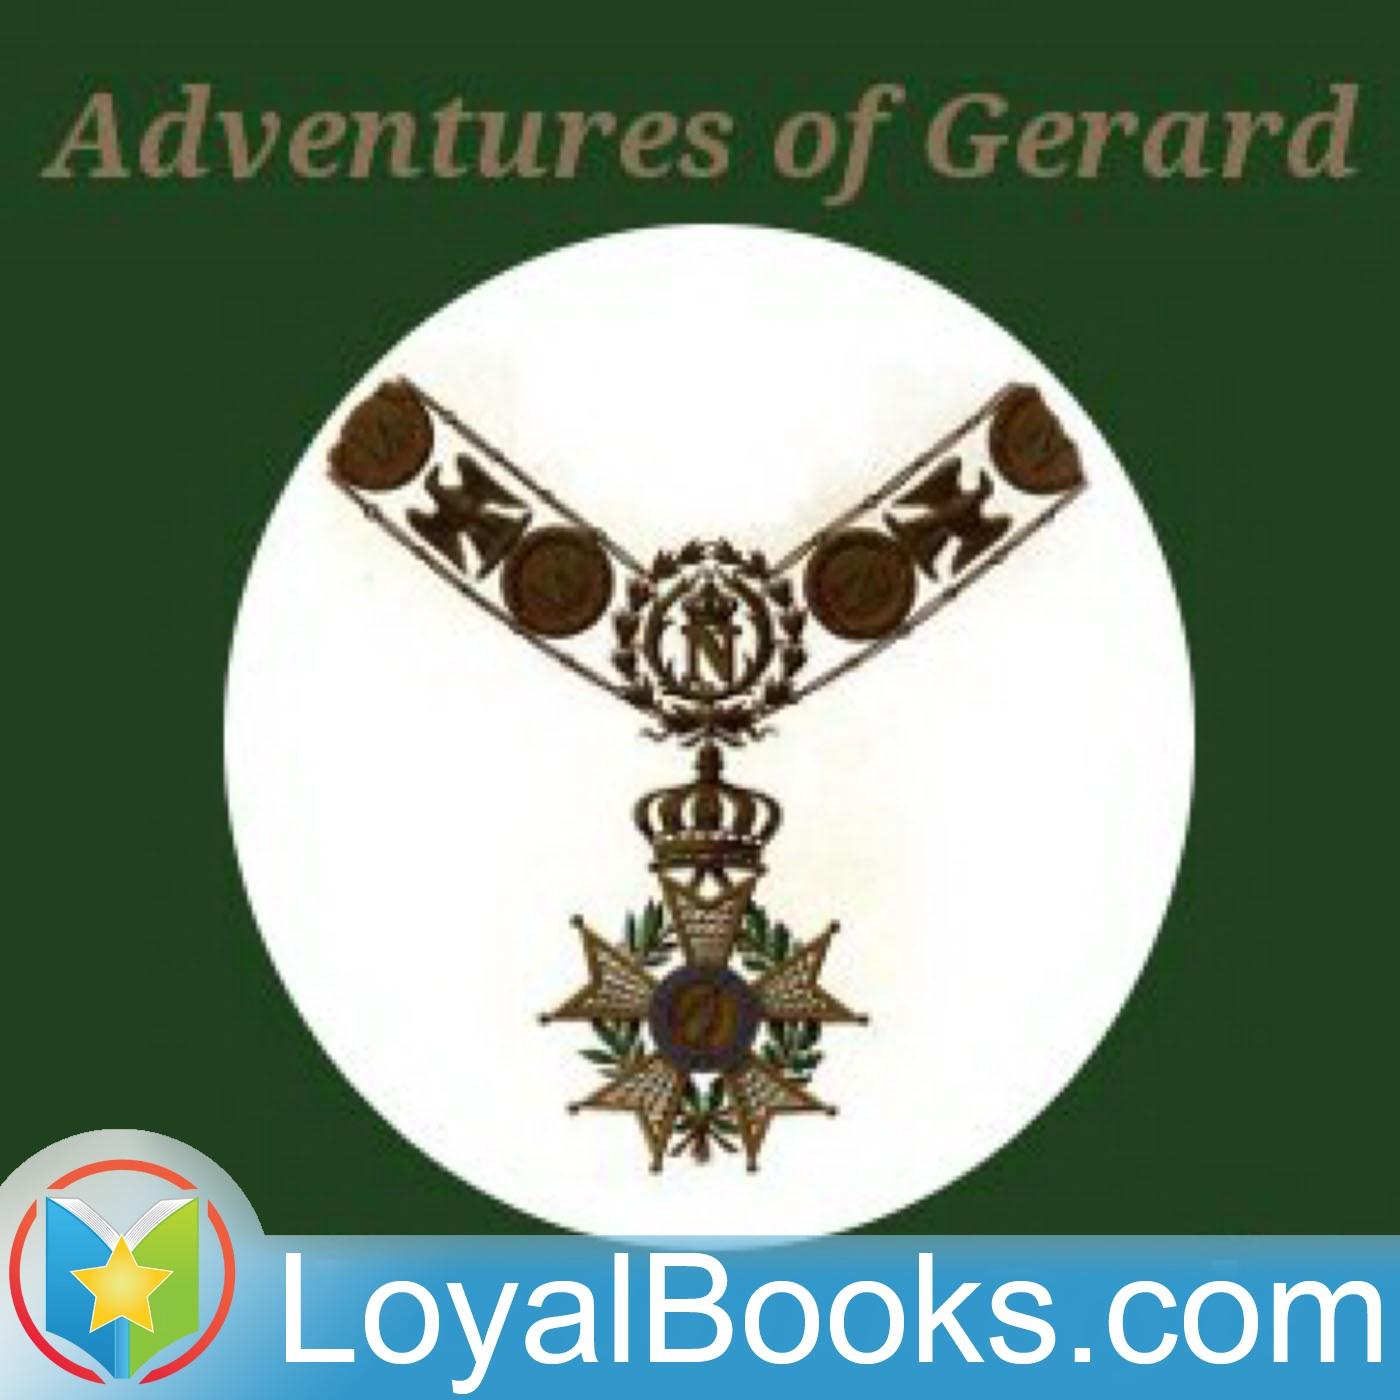 <![CDATA[The Adventures of Gerard by Sir Arthur Conan Doyle]]>